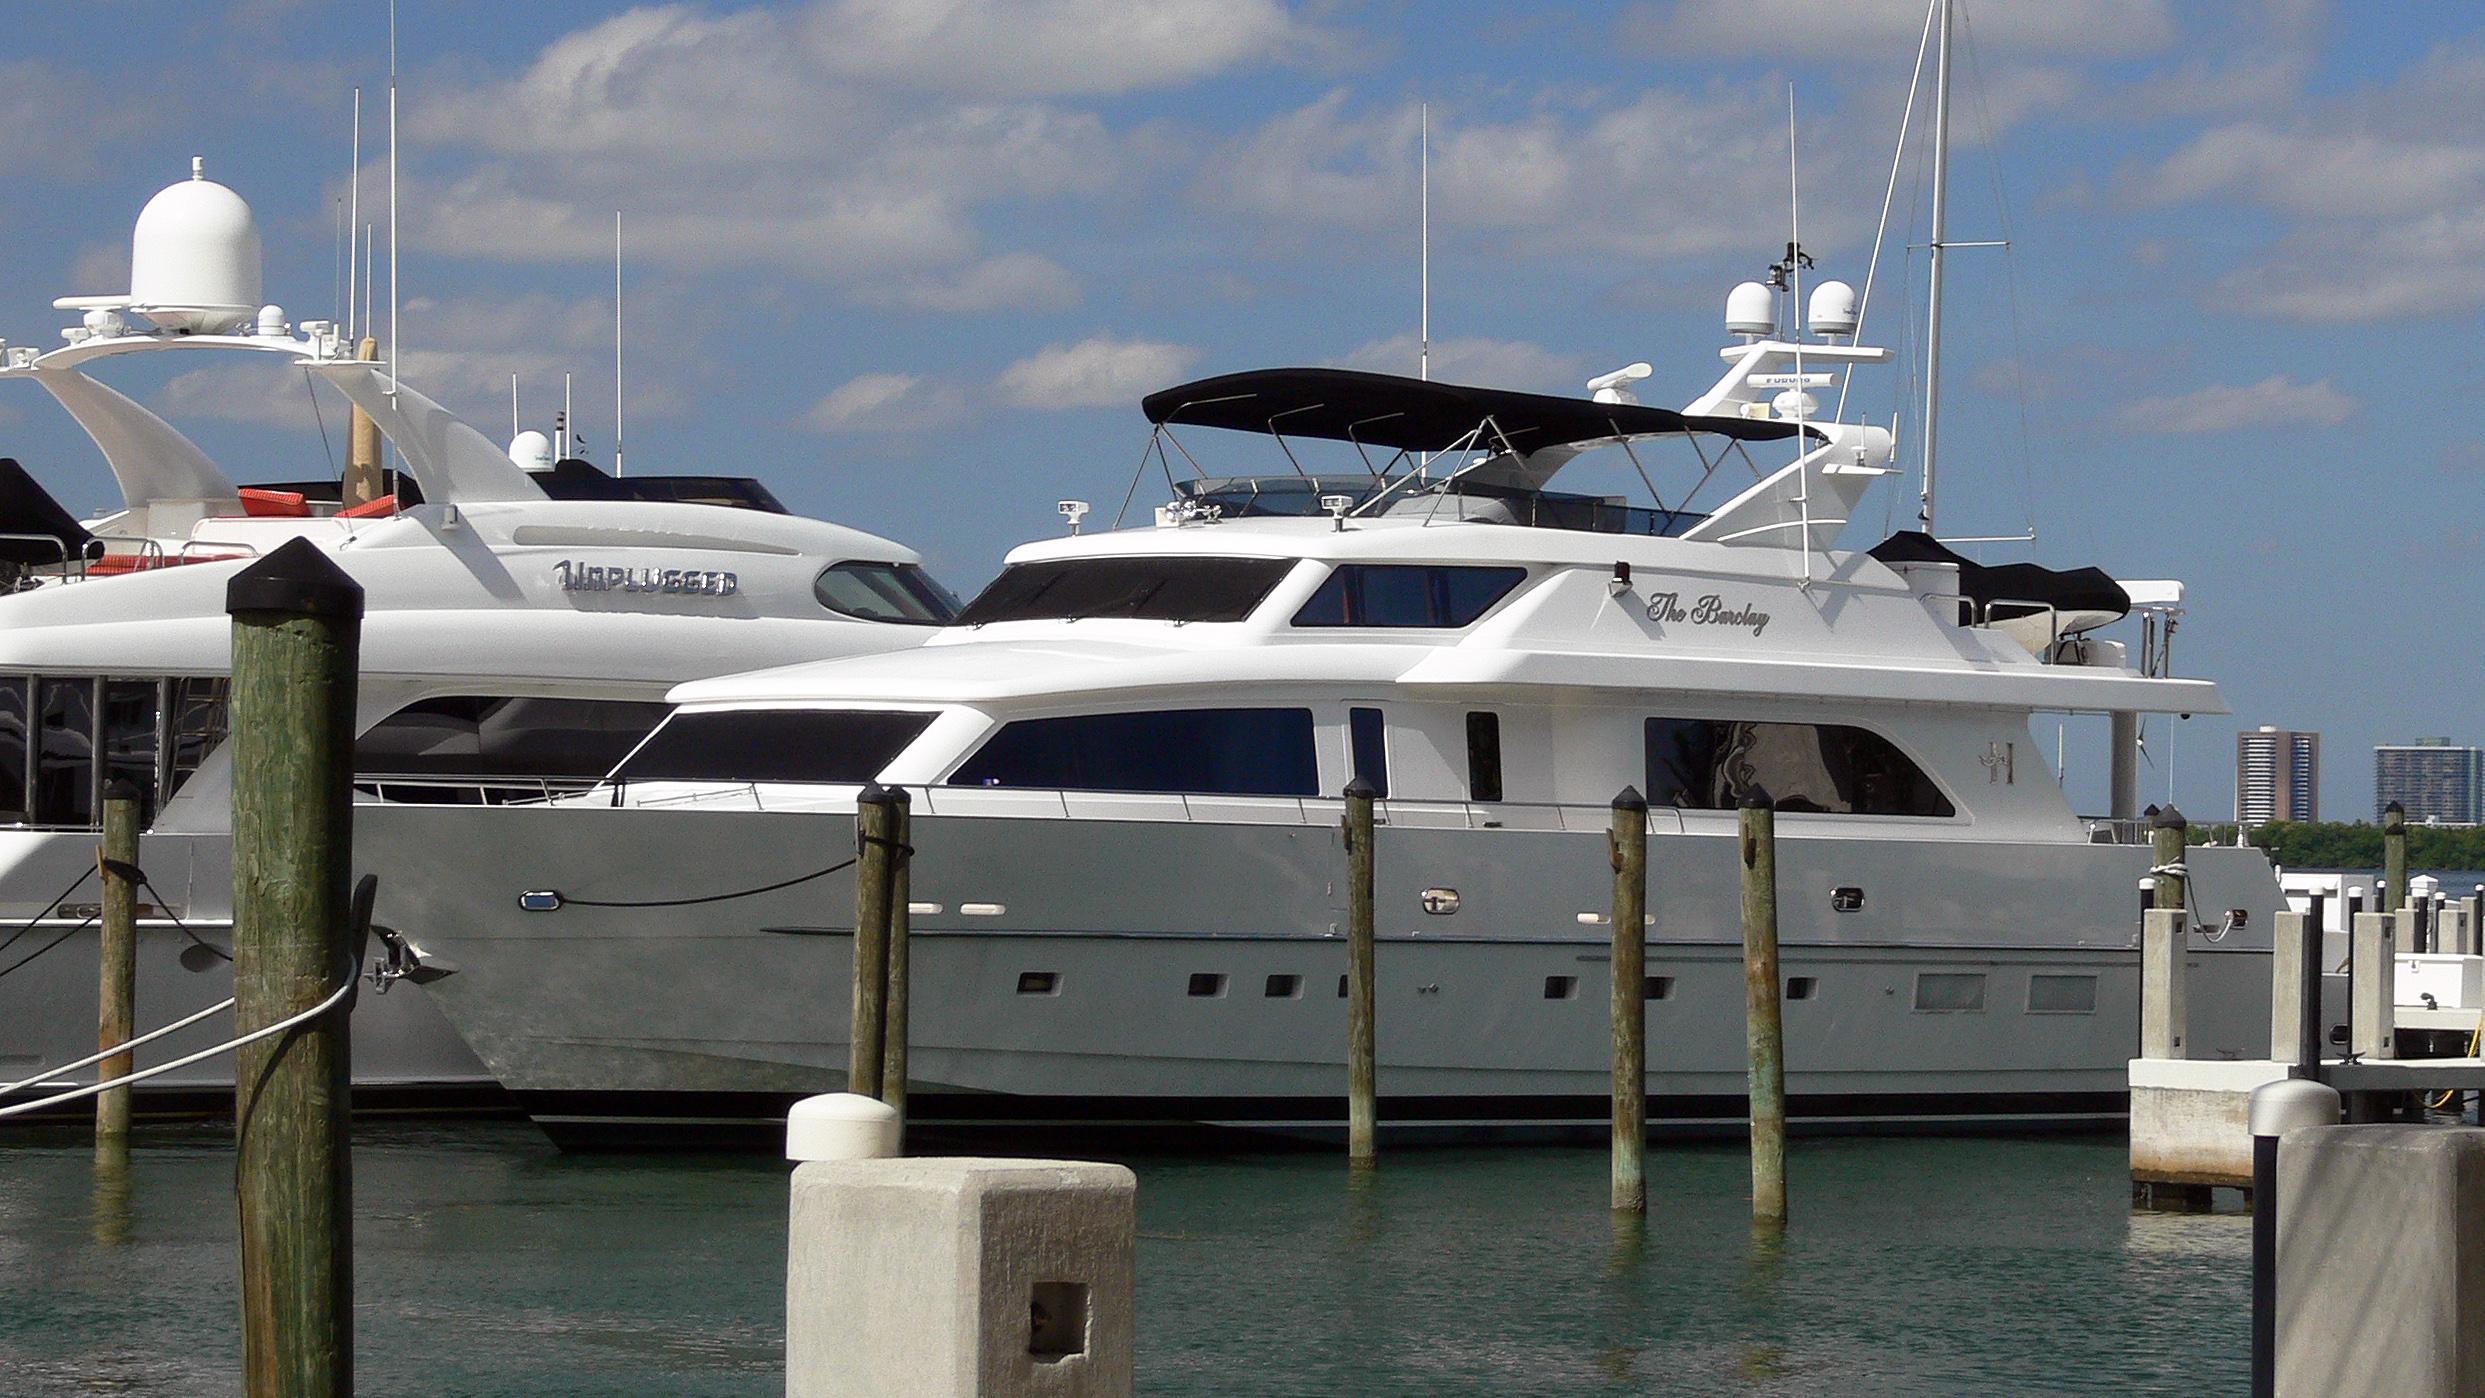 dolly-motor-yacht-hargrave-90-rph-2004-27m-berth-profile